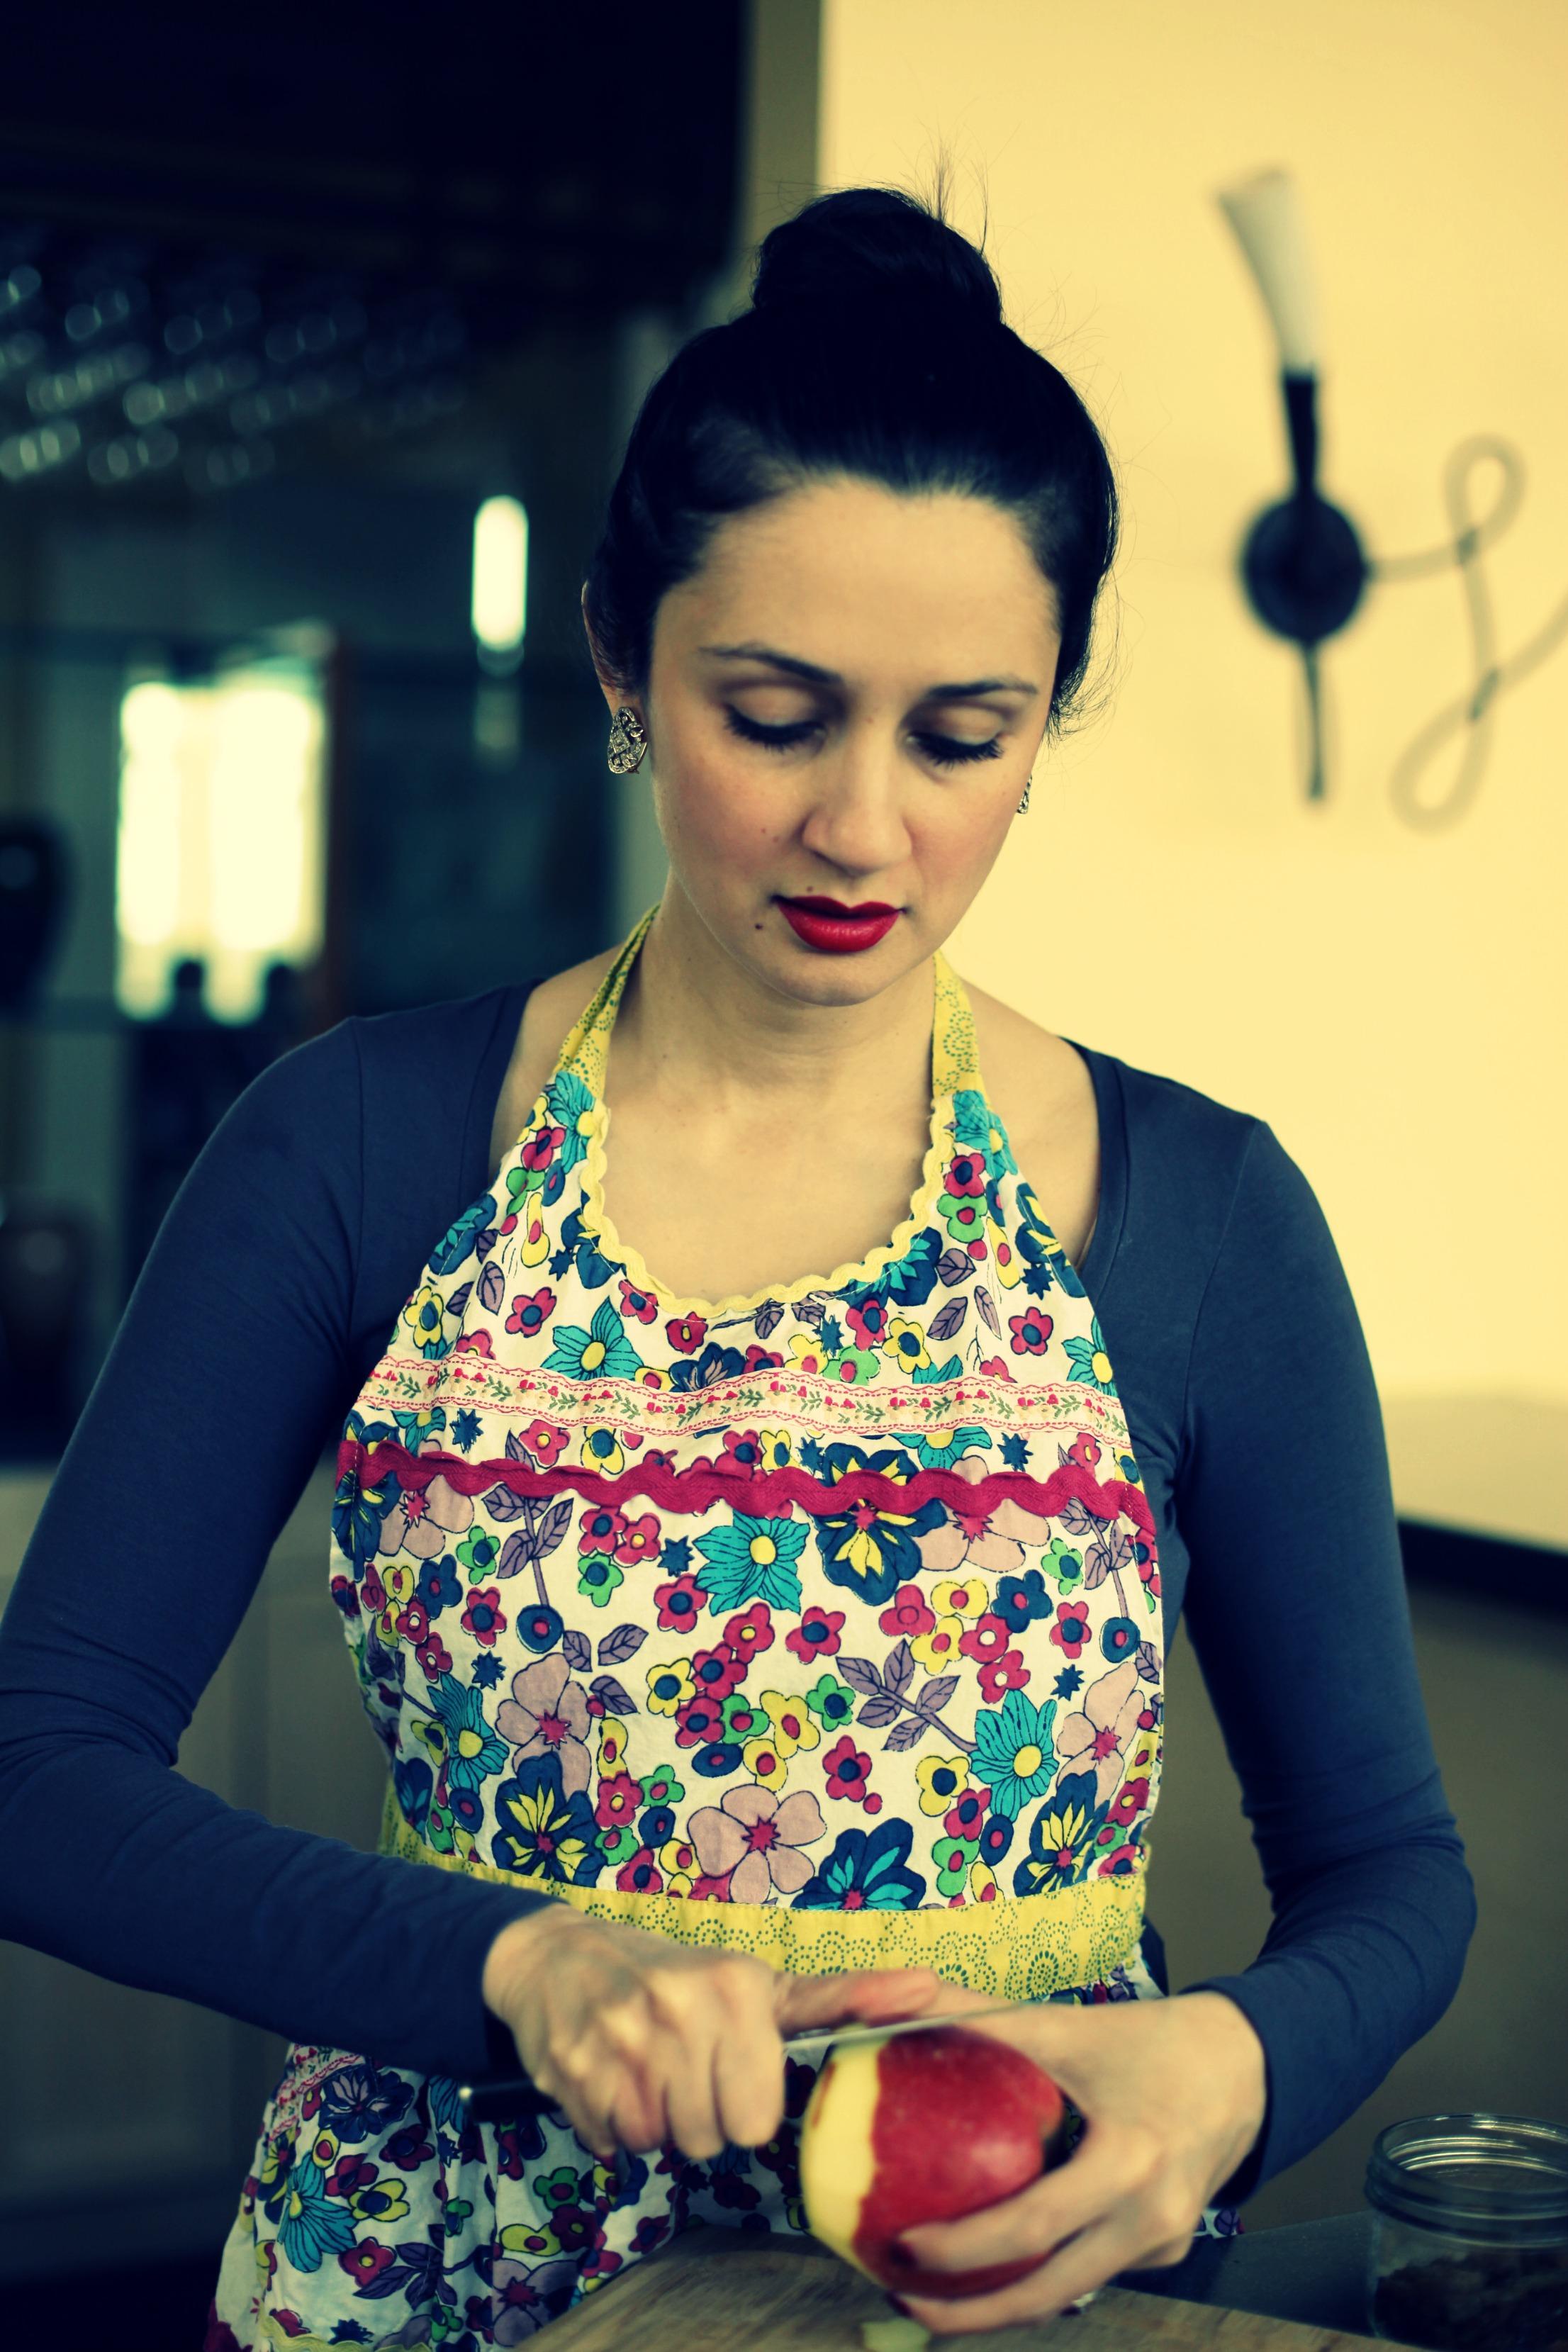 Saadat preparing a meal in her Toronto kitchen. (Shayma Saadat)